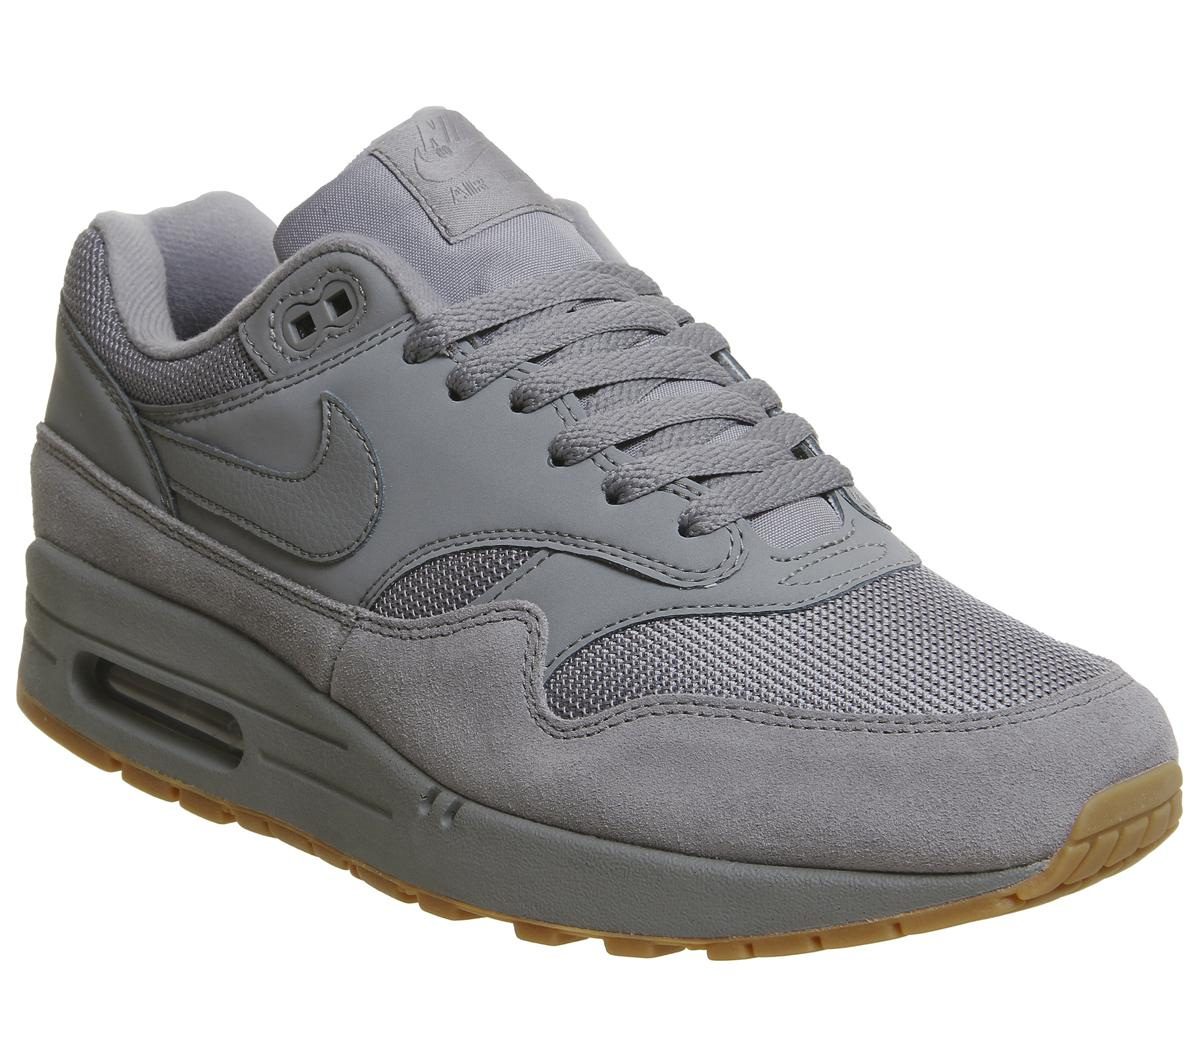 nike mens grey trainers